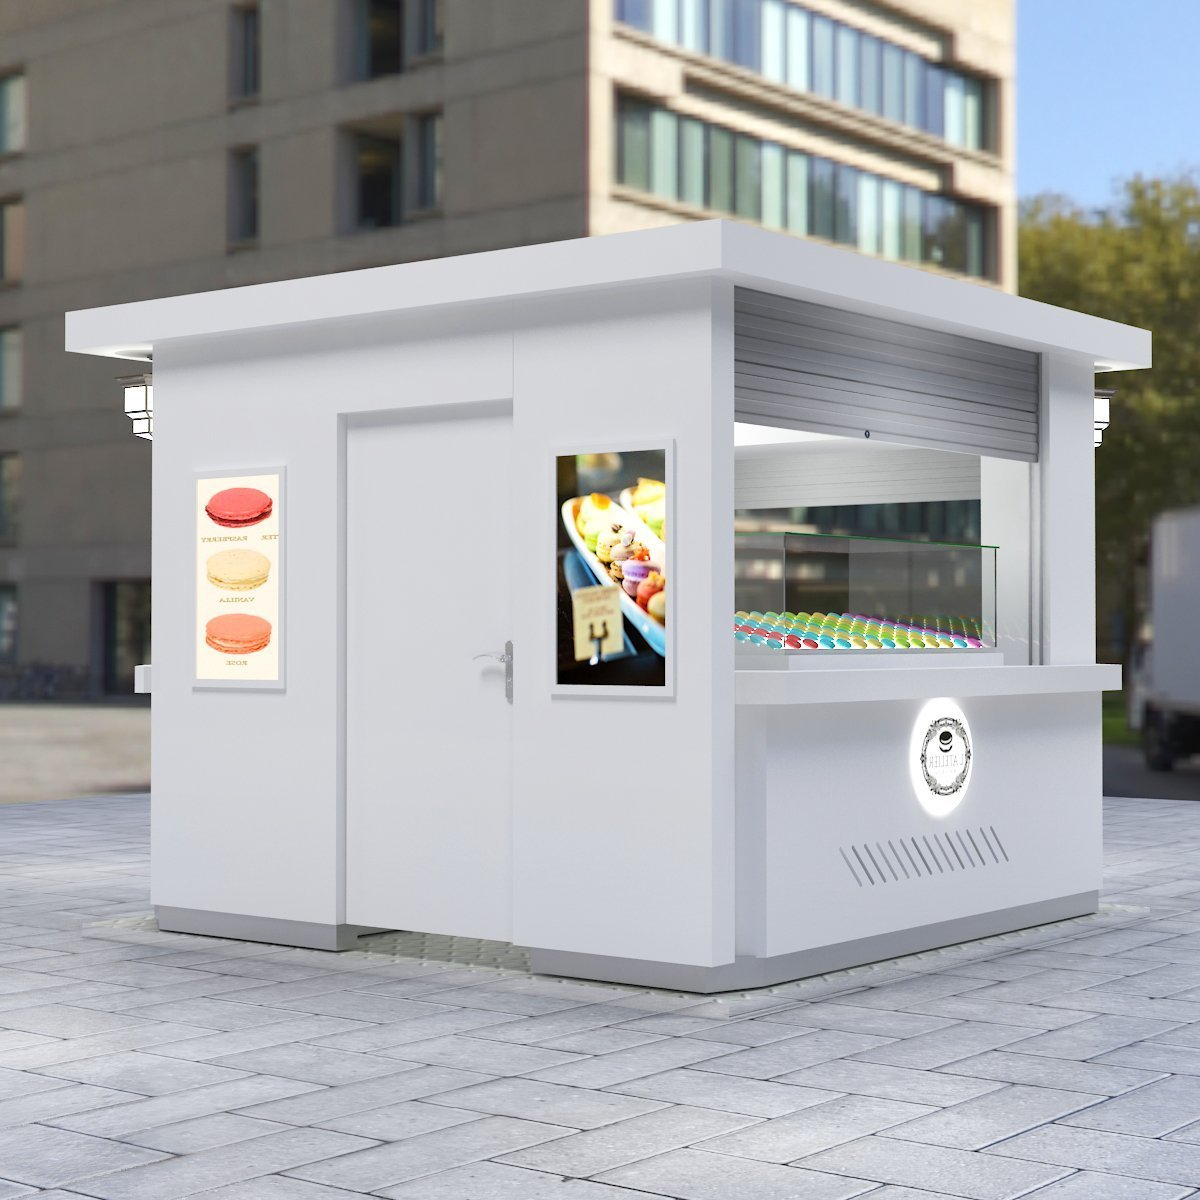 macaron kiosk